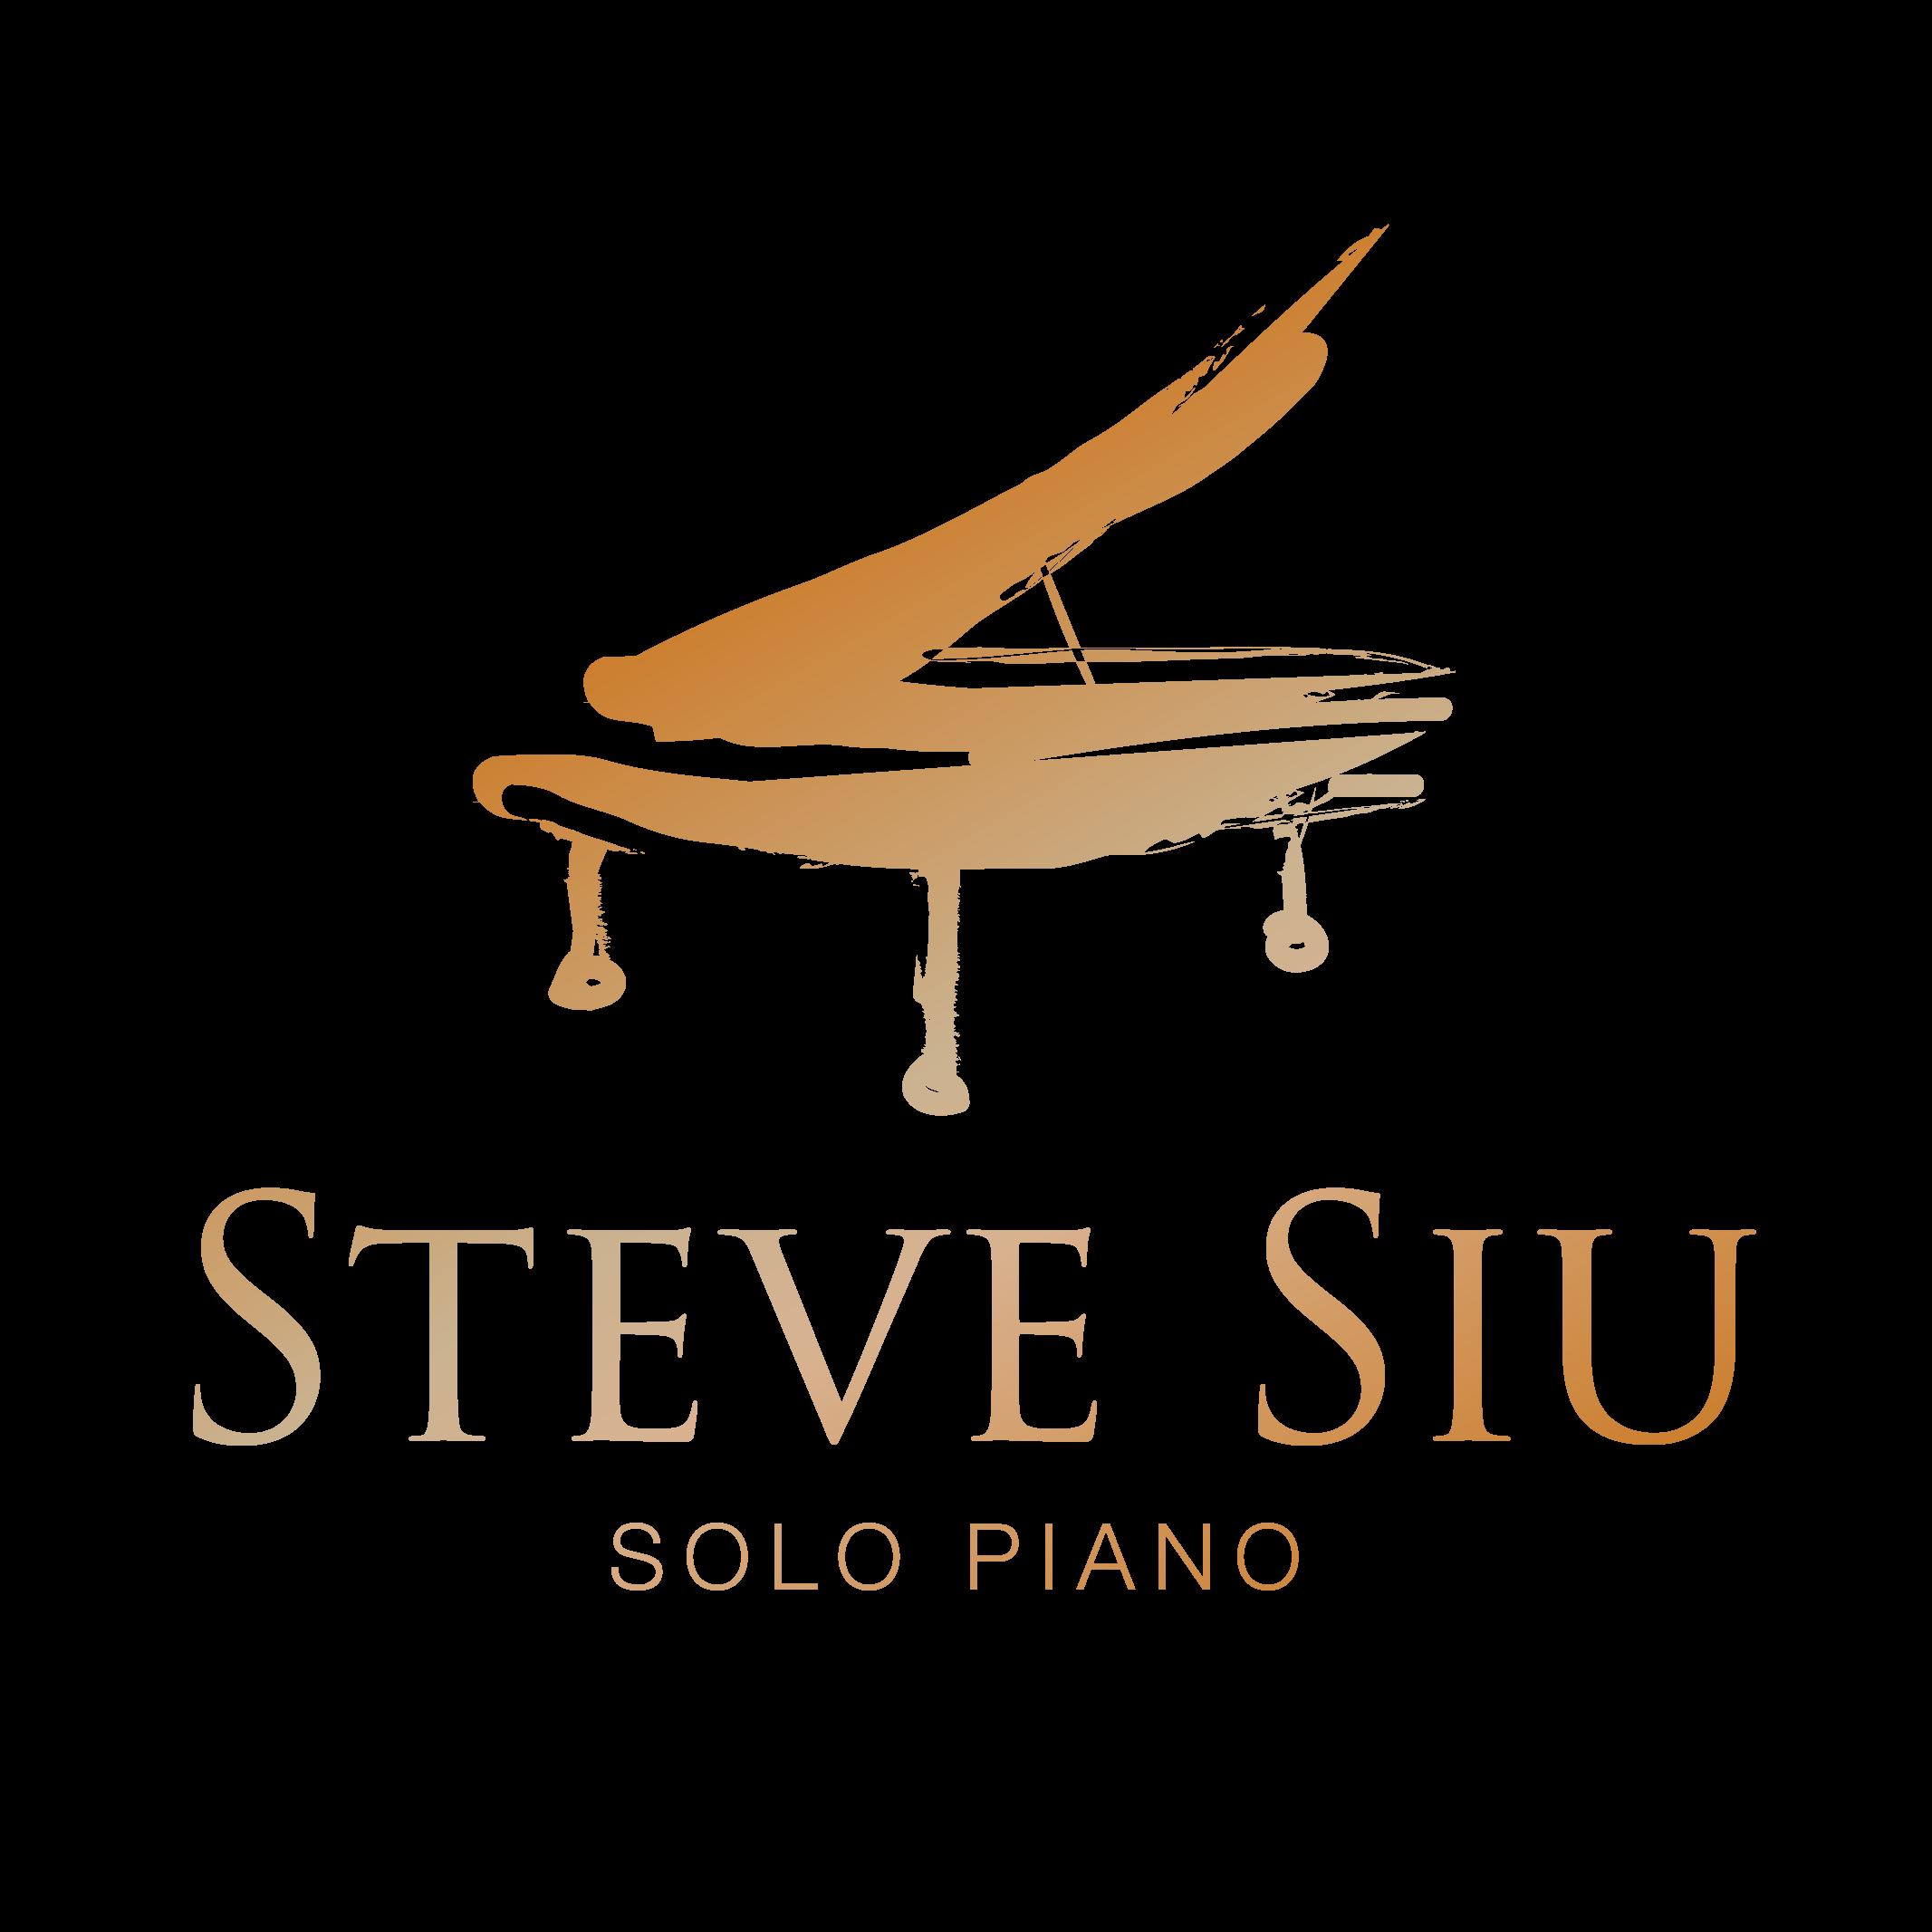 Steve Siu Piano – Exquisite Piano Interpretation of Modern and